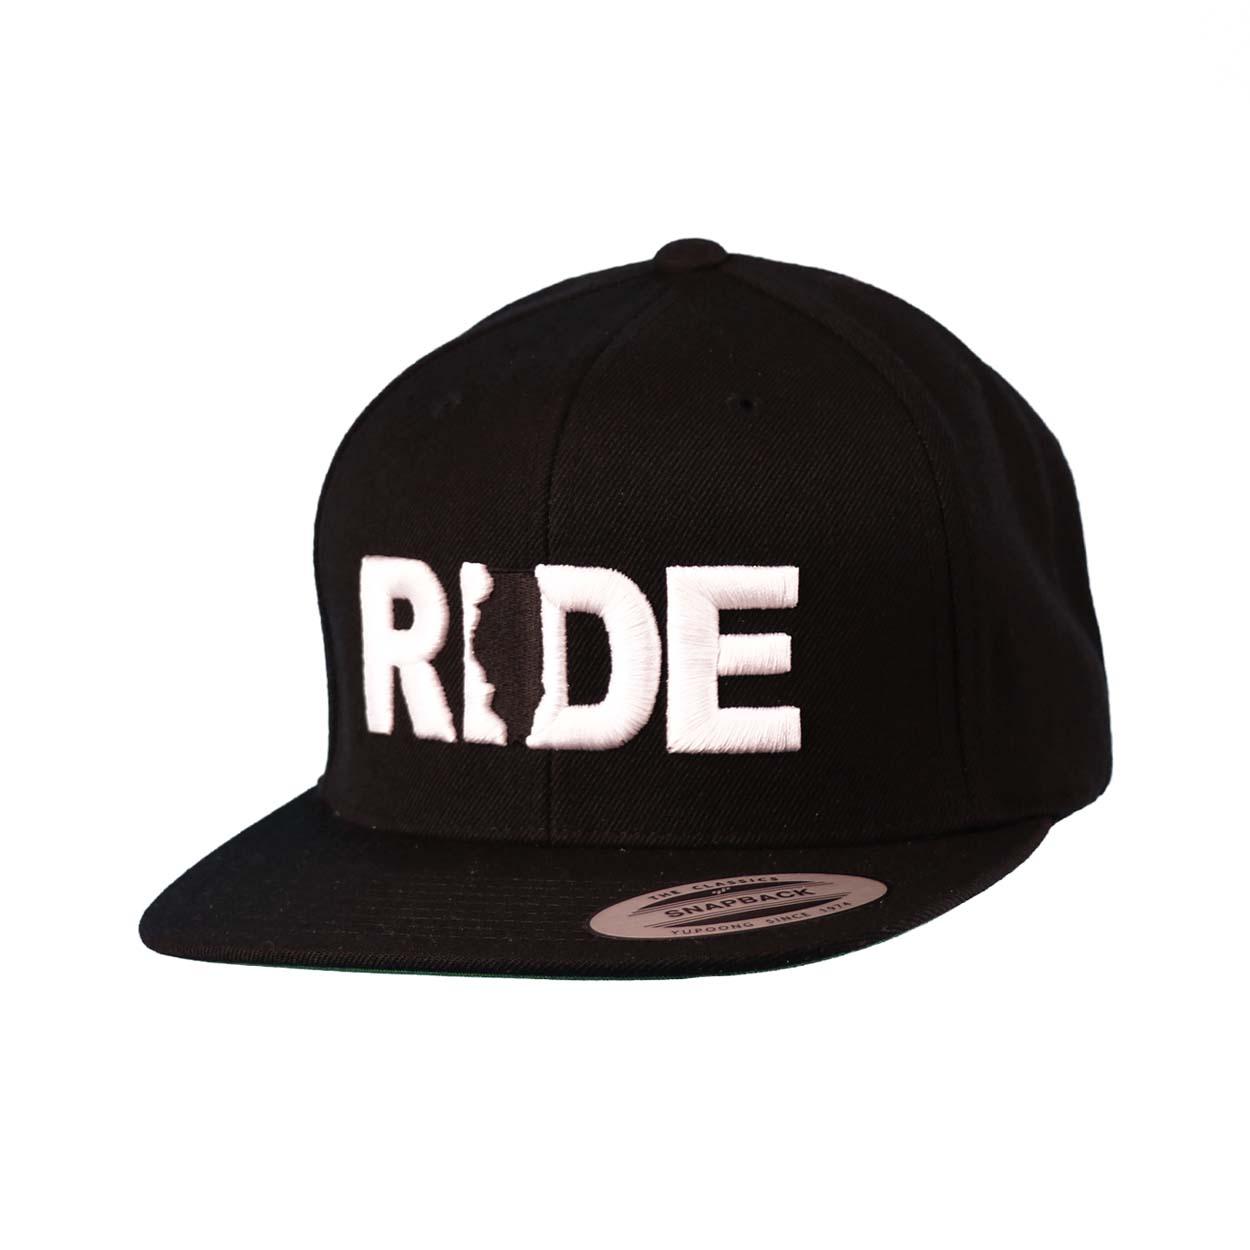 Ride Illinois Classic Embroidered  Snapback Flat Brim Hat Black/White